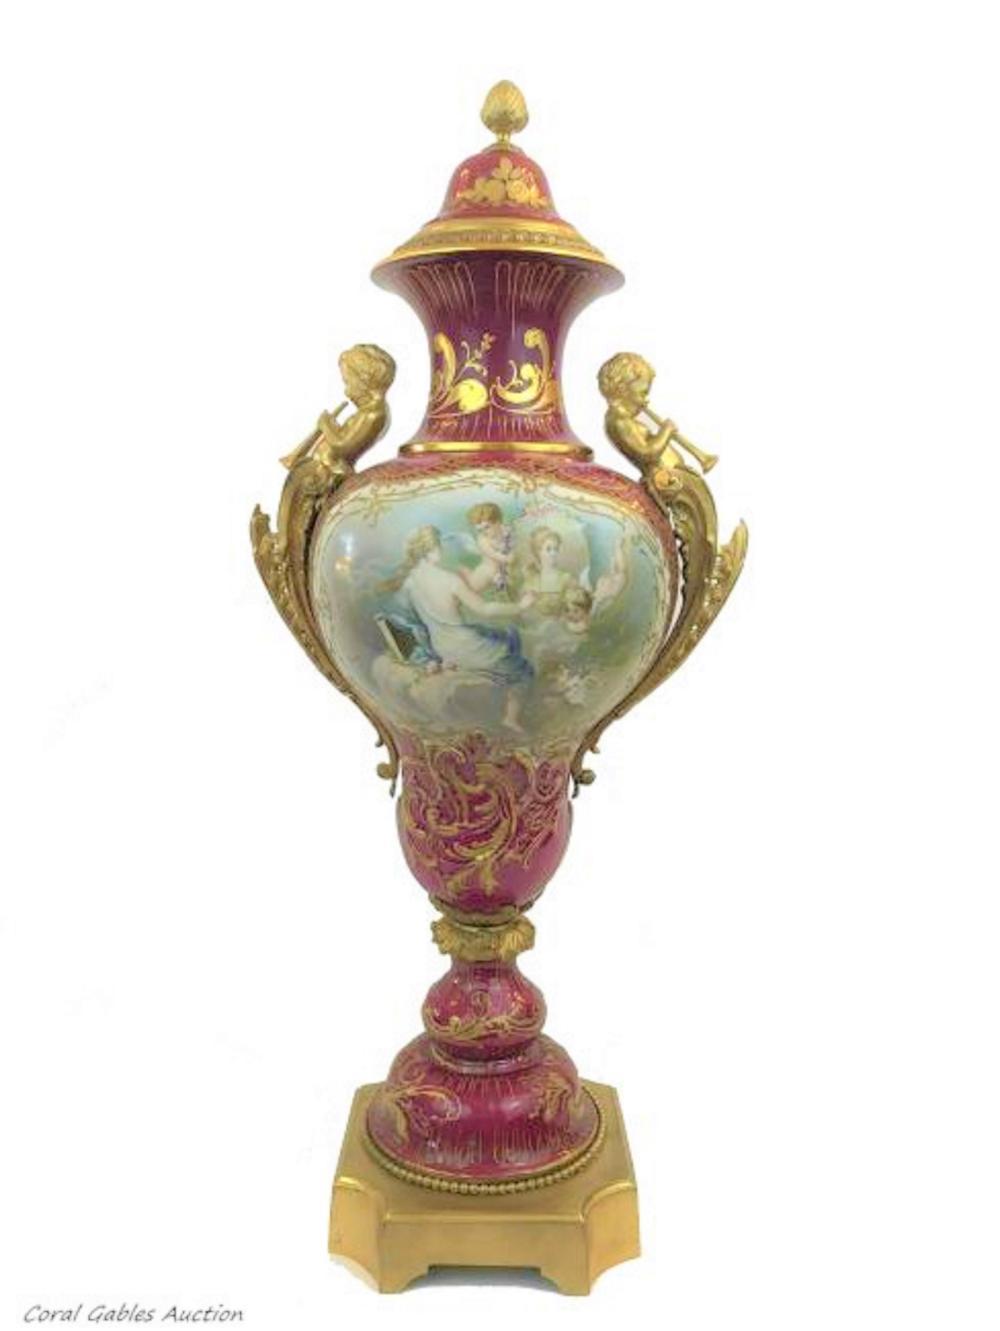 Antique porcelain sevre of the 19th century